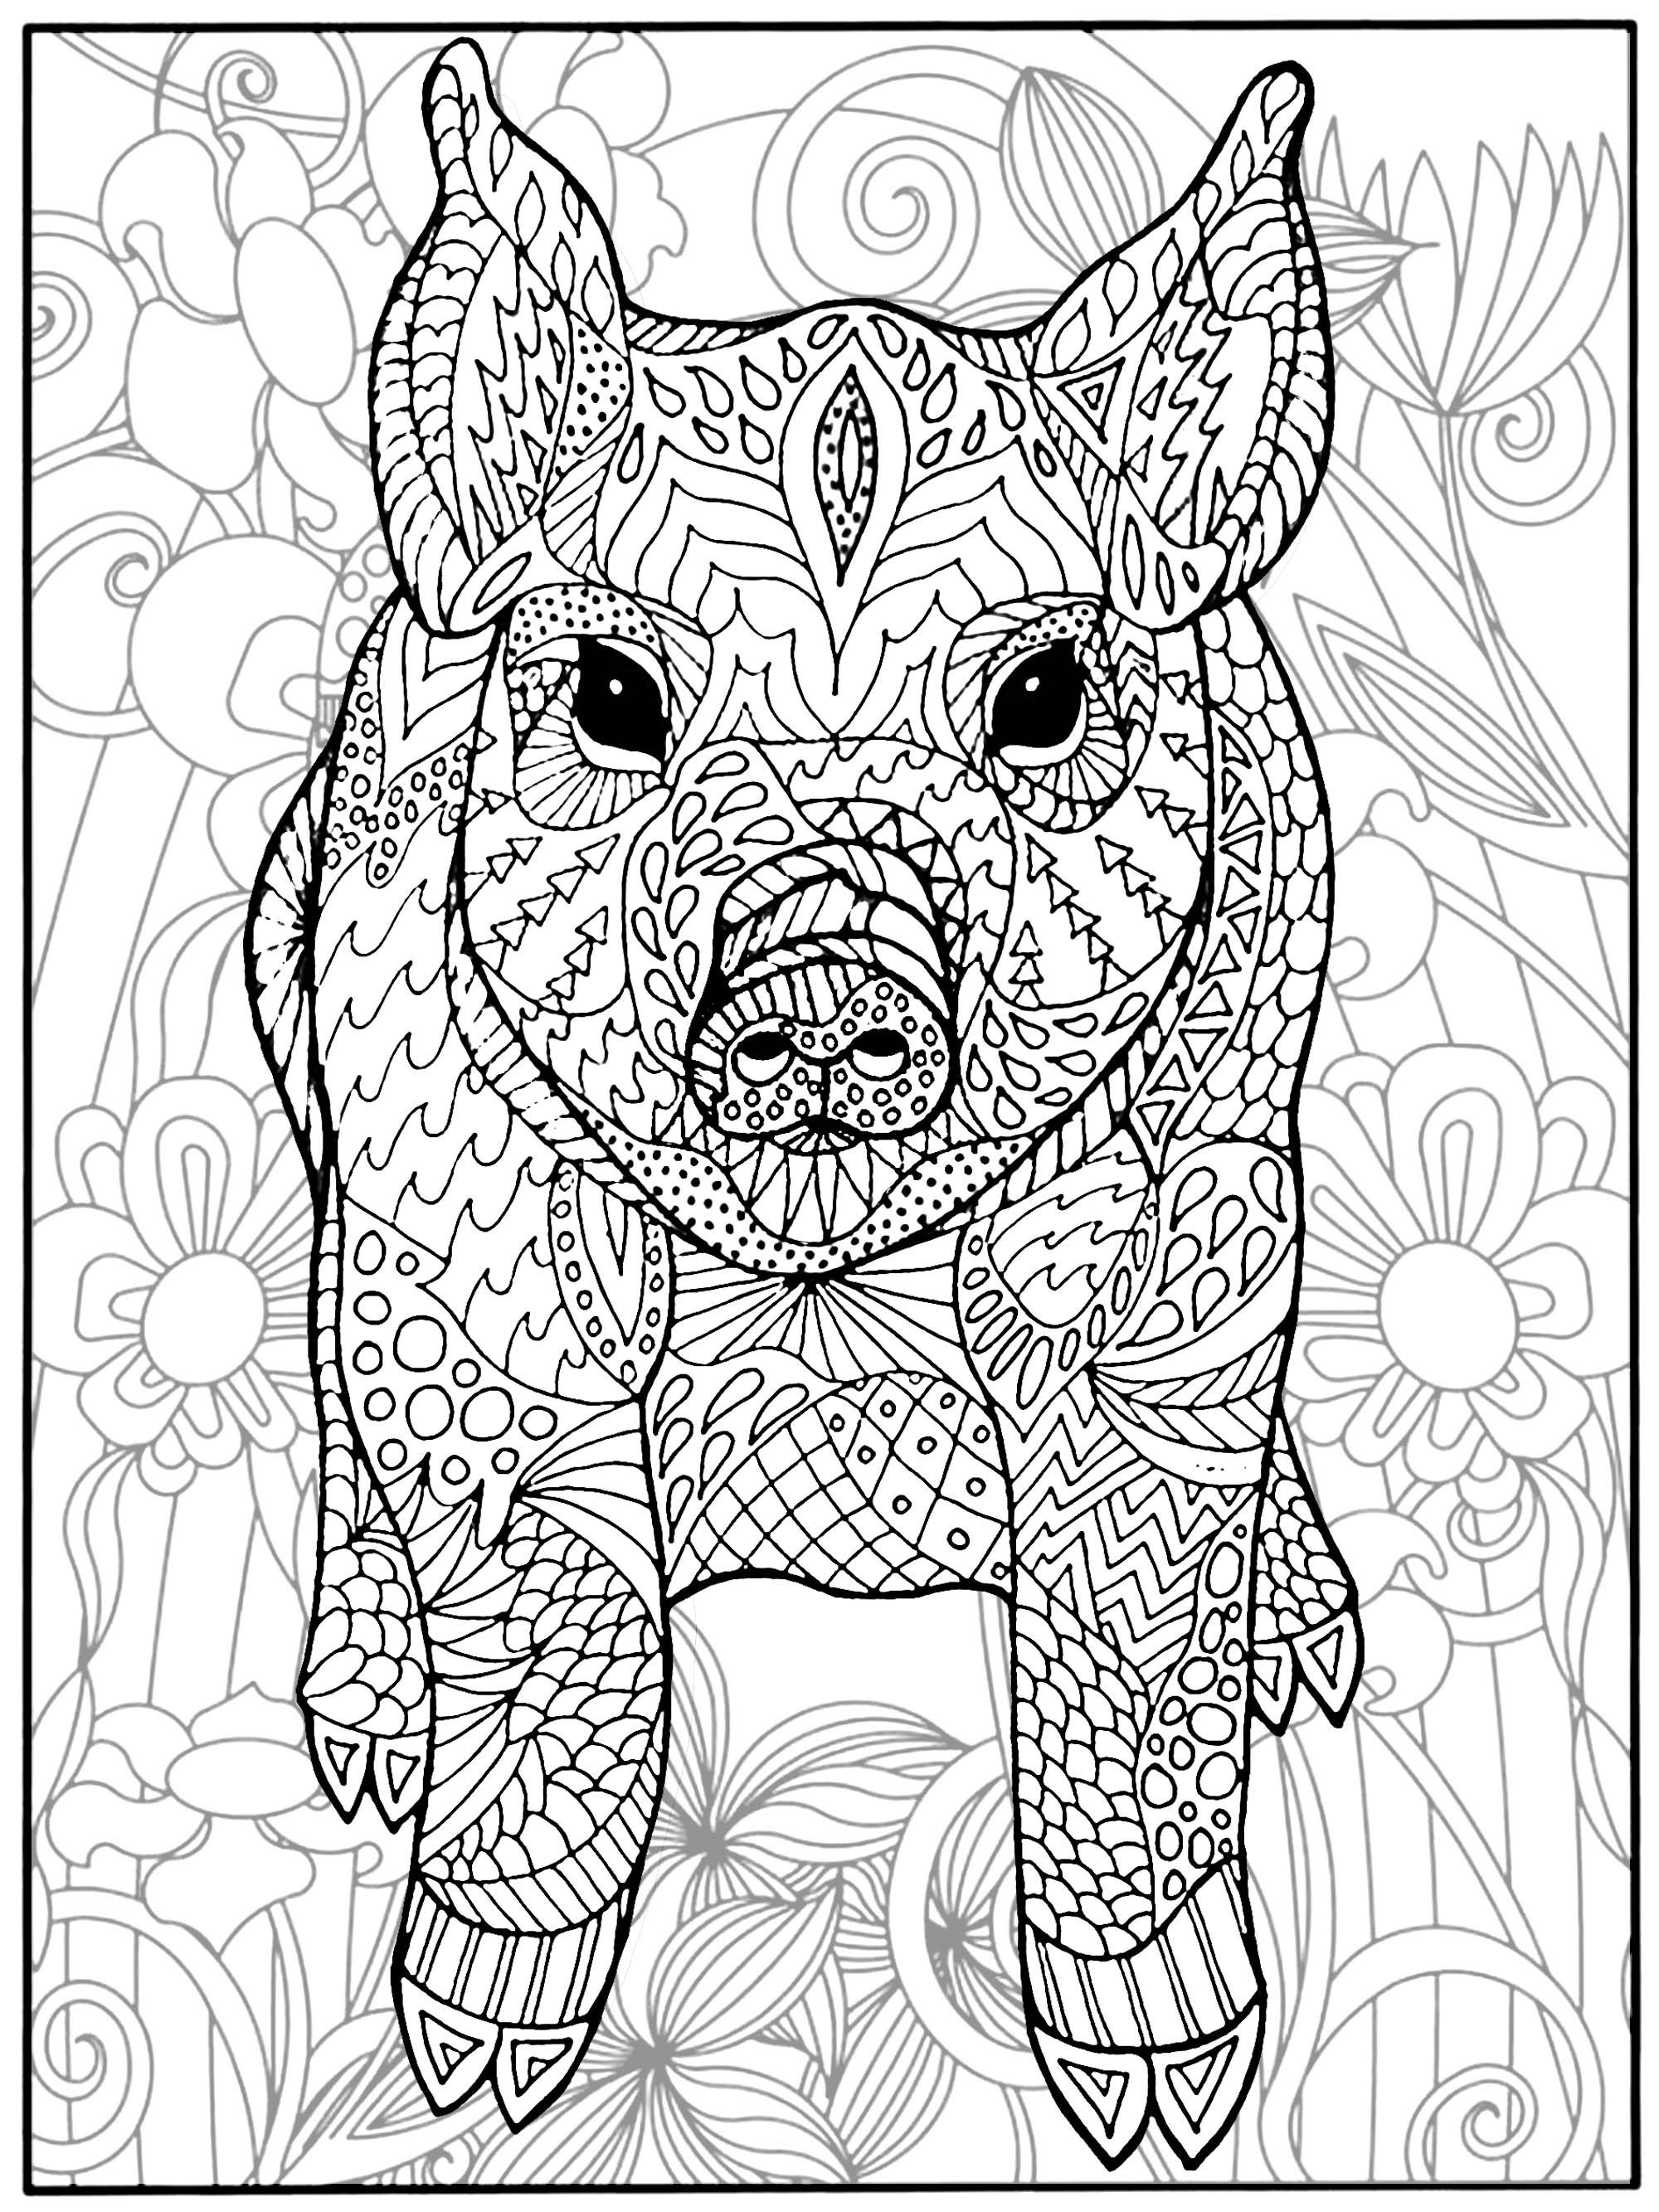 Cerdos 16210 - Cerdos - Colorear para Adultos